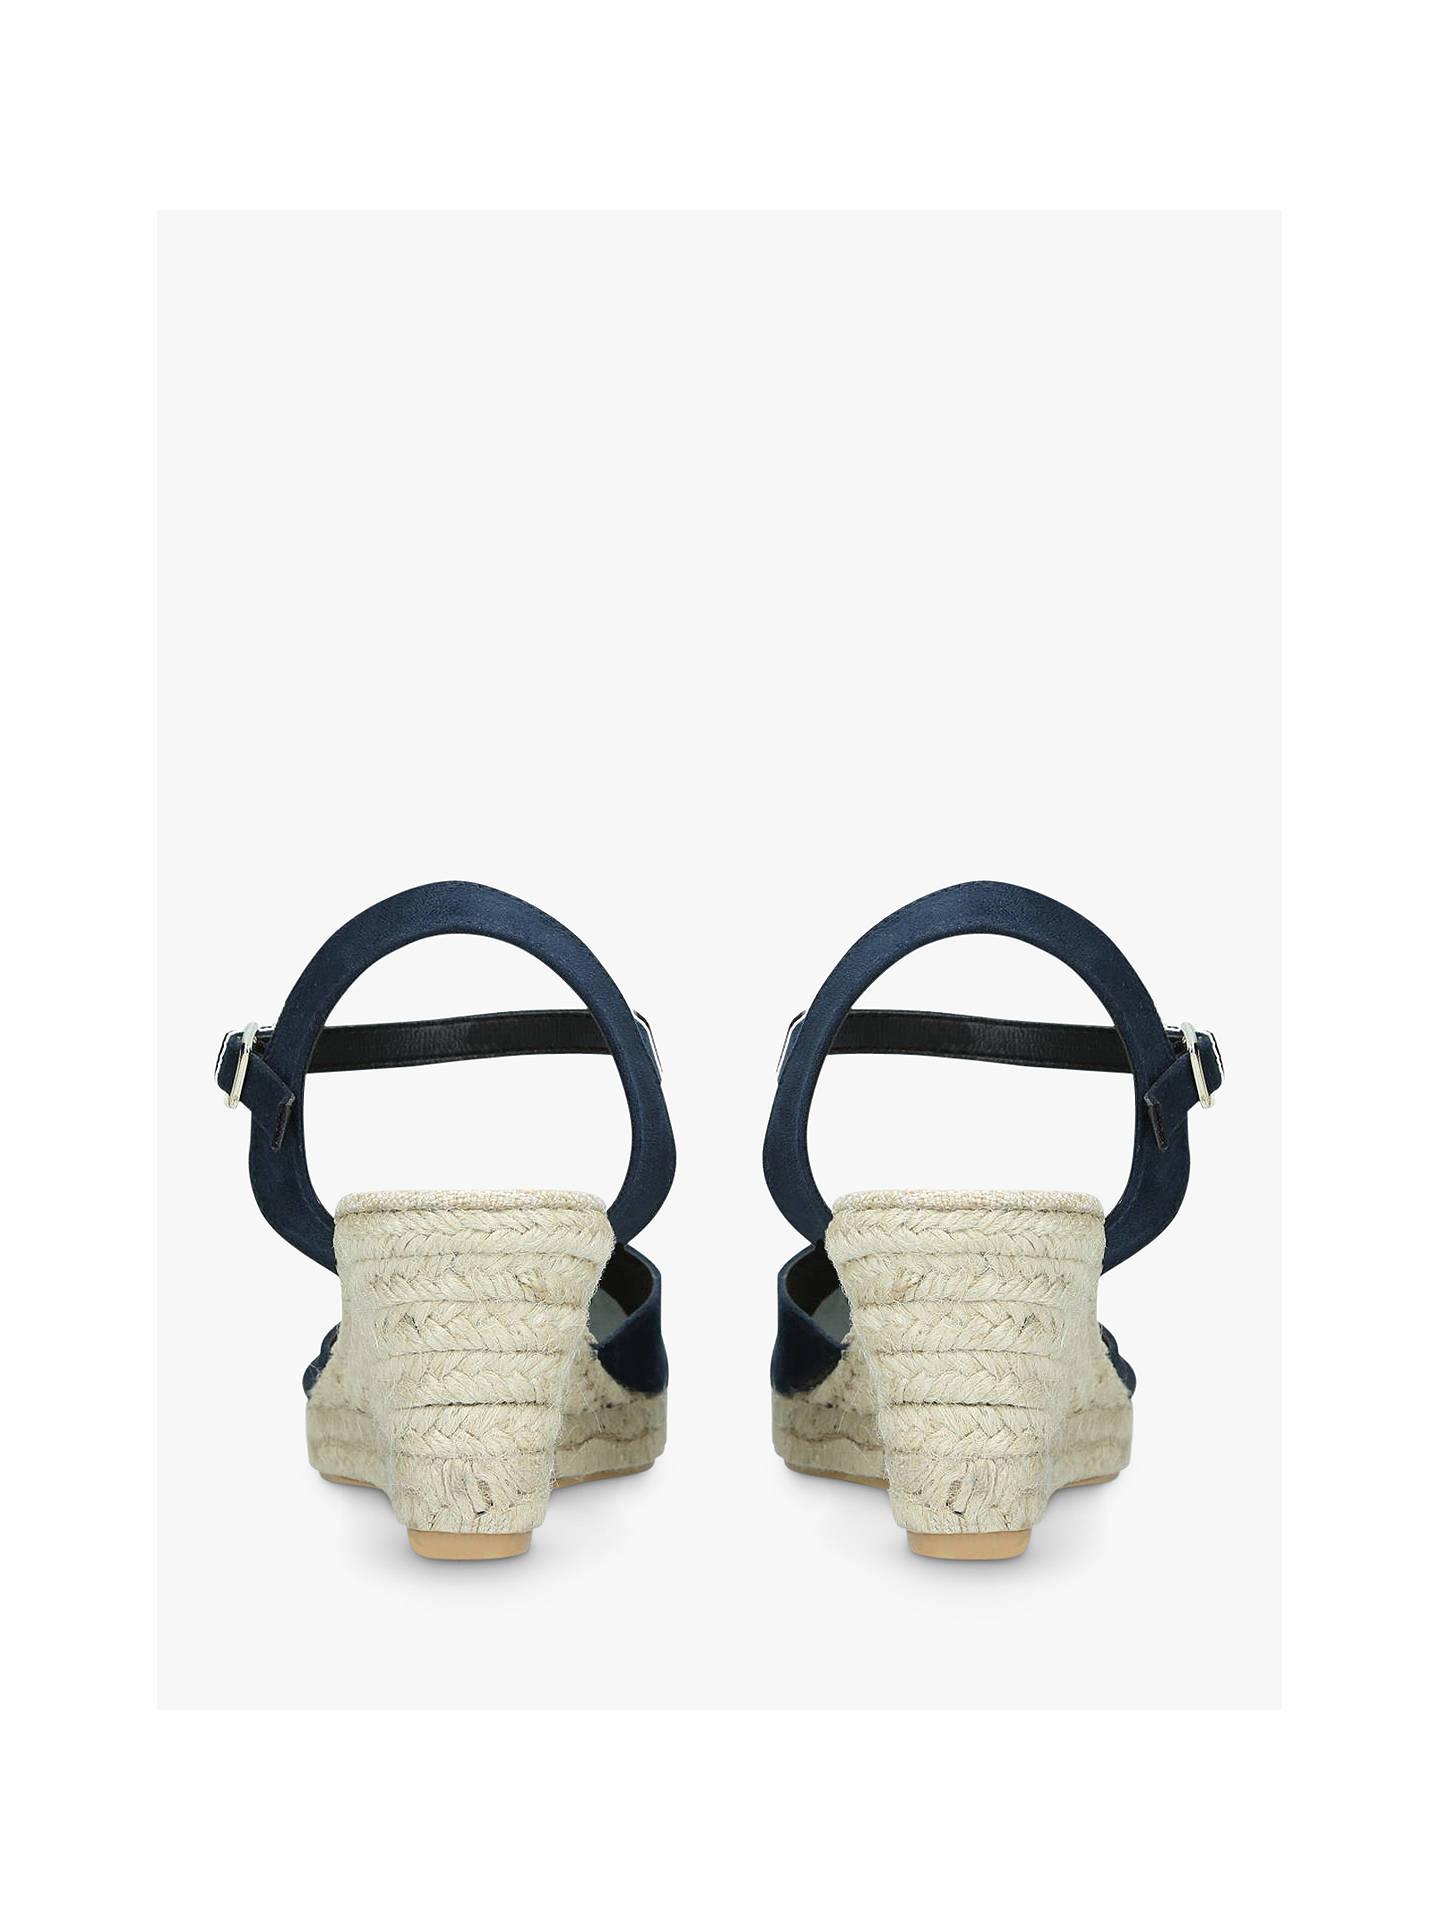 870f58defca Carvela Sabrina 2 Wedge Heel Sandals, Dark Blue at John Lewis & Partners